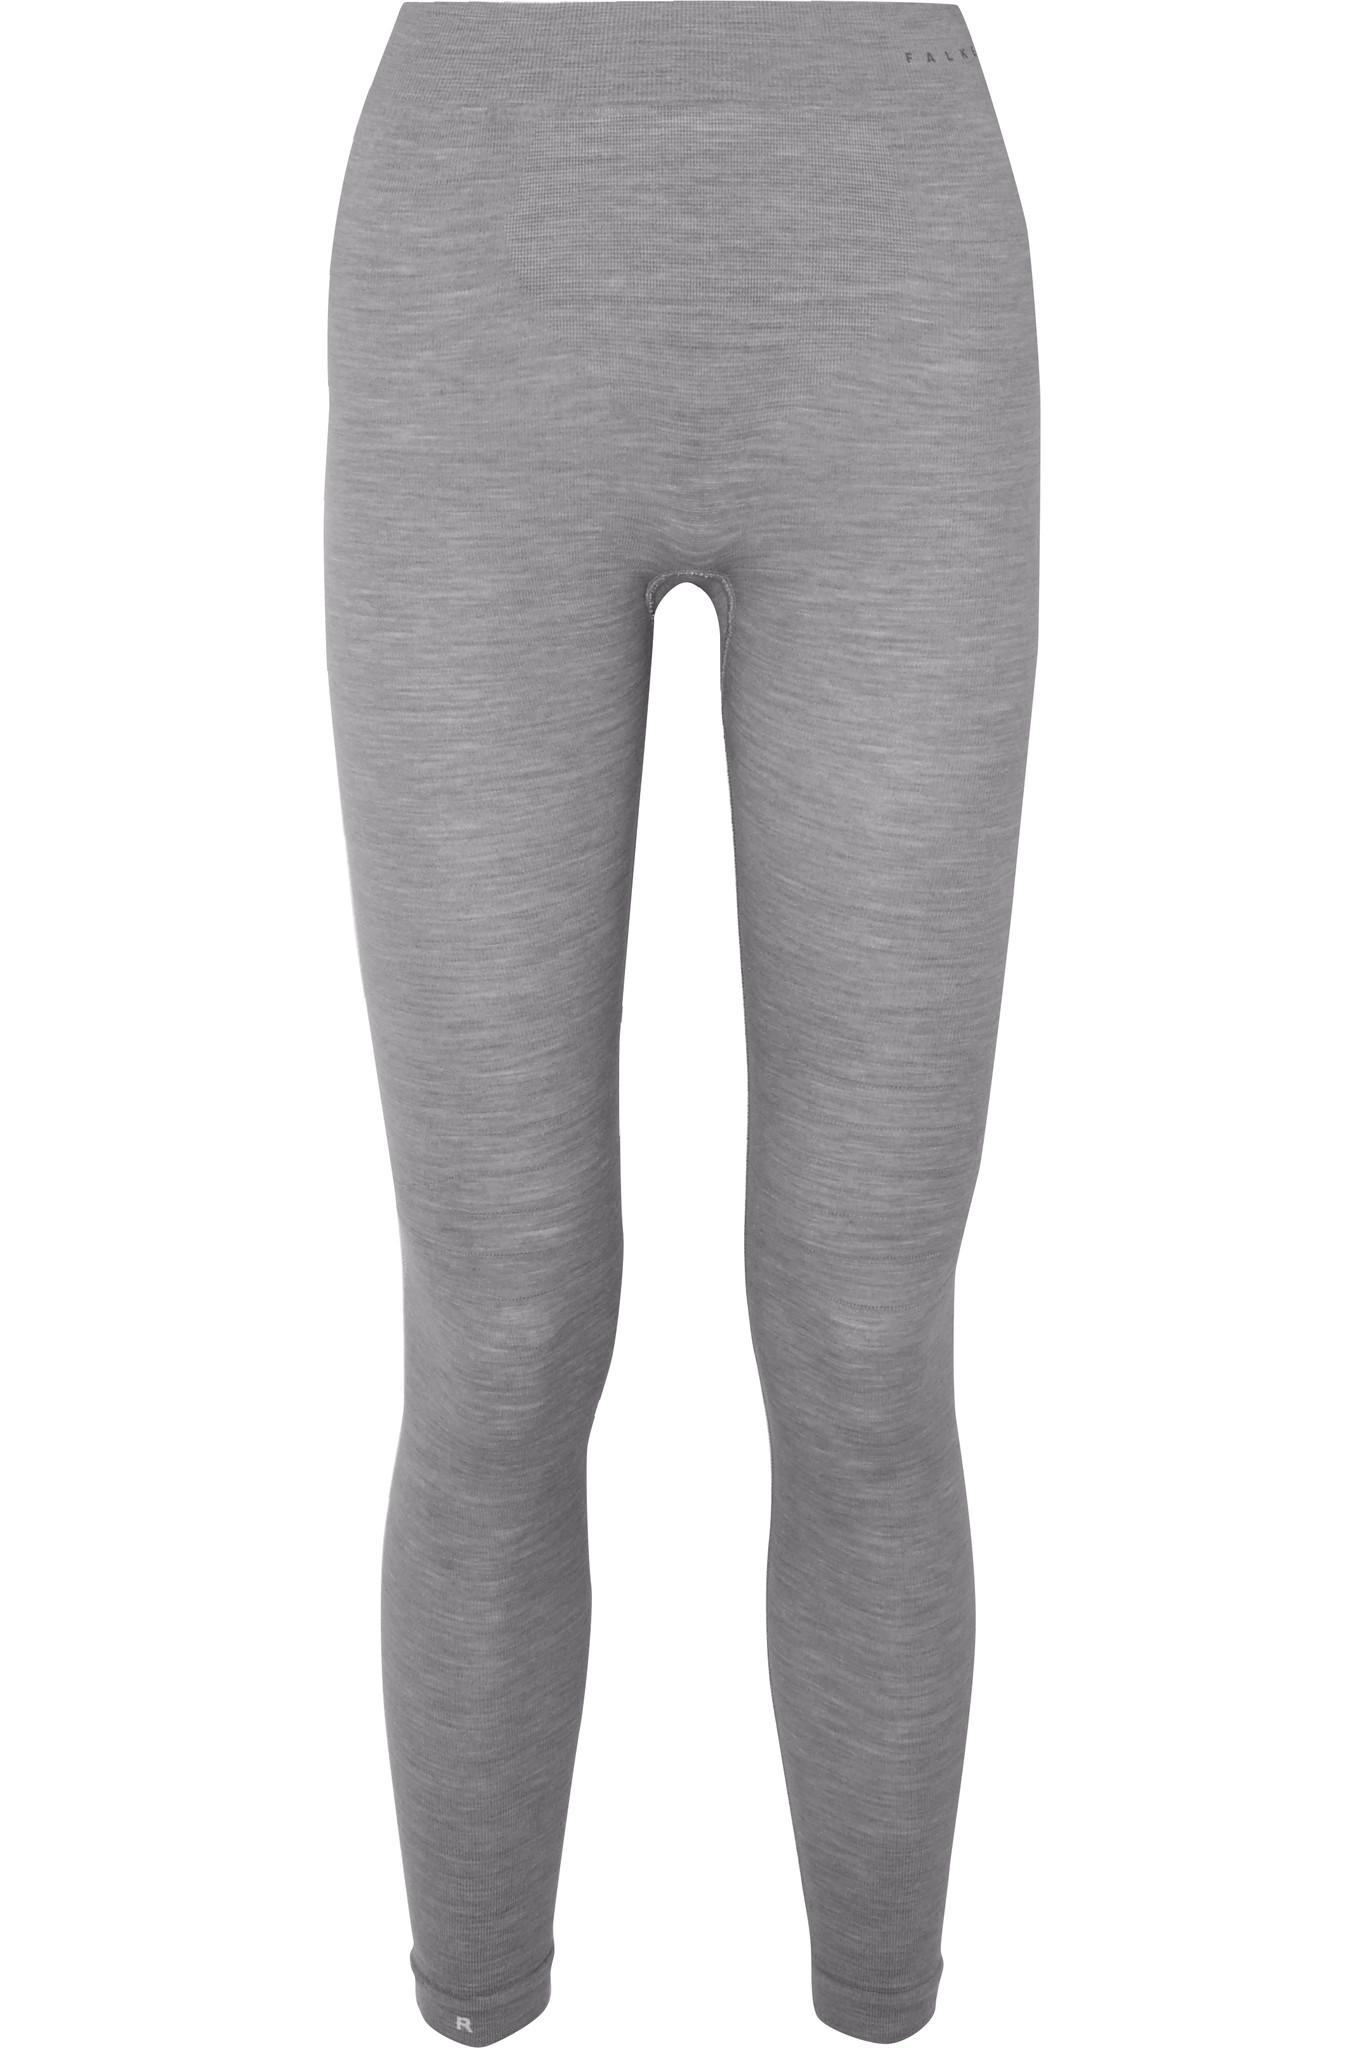 FALKE ERGONOMIC SPORT SYSTEM - Paneled Technical Stretch Wool-blend Leggings - Gray - large